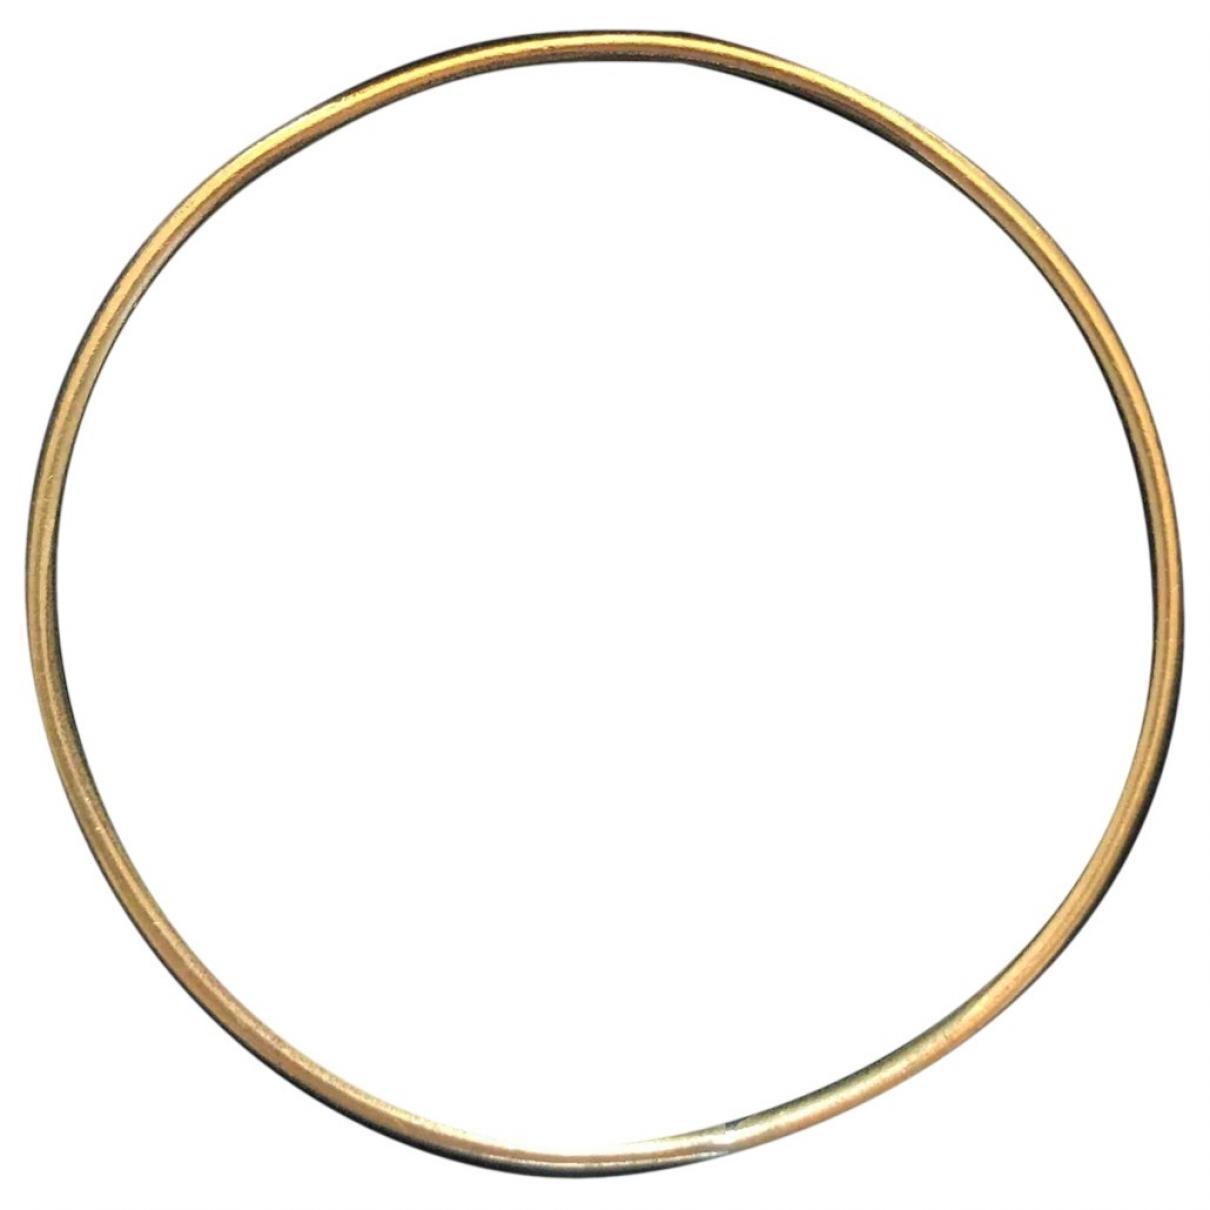 Adeline Affre - Bracelet   pour femme en plaque or - dore